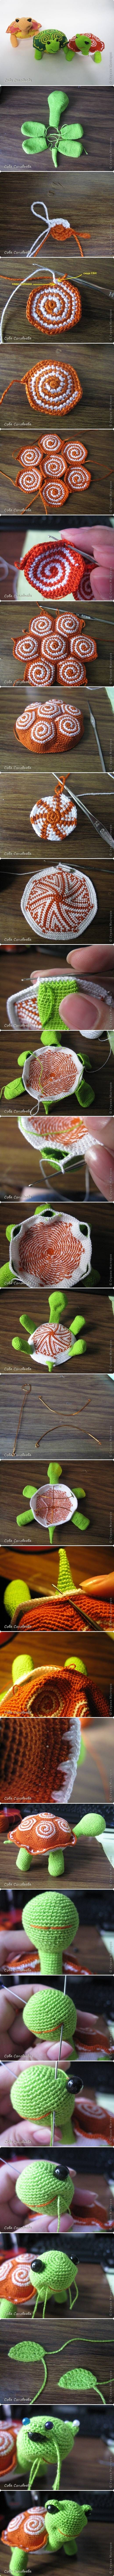 DIY Cute Crochet Turtles | iCreativeIdeas.com Like Us on Facebook ==> https://www.facebook.com/icreativeideas